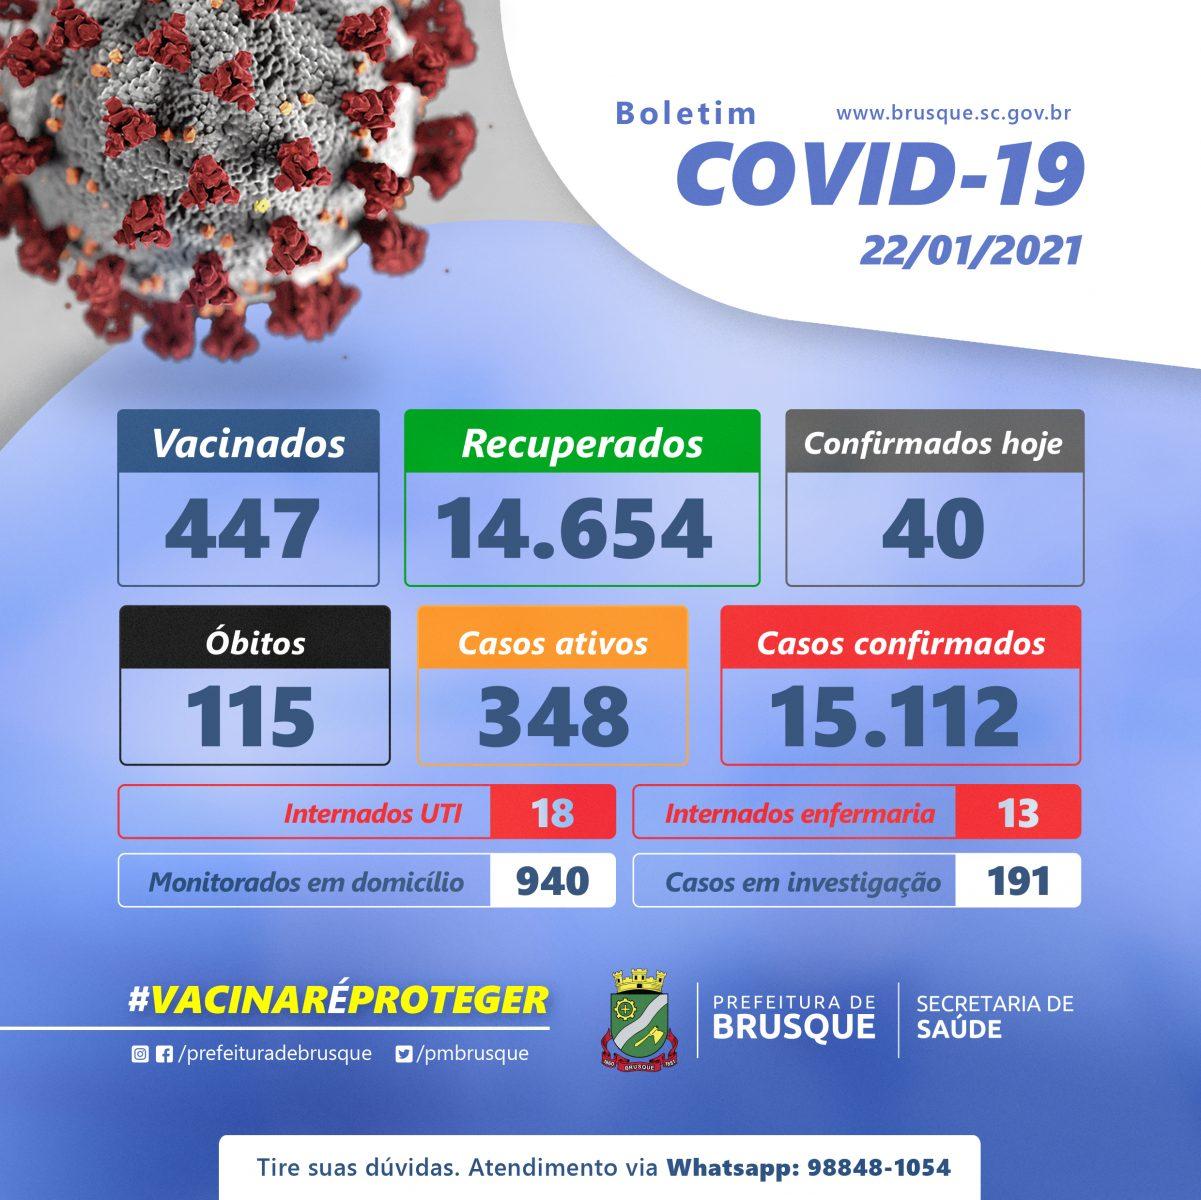 Covid-19: Confira o boletim epidemiológico desta sexta-feira (22)